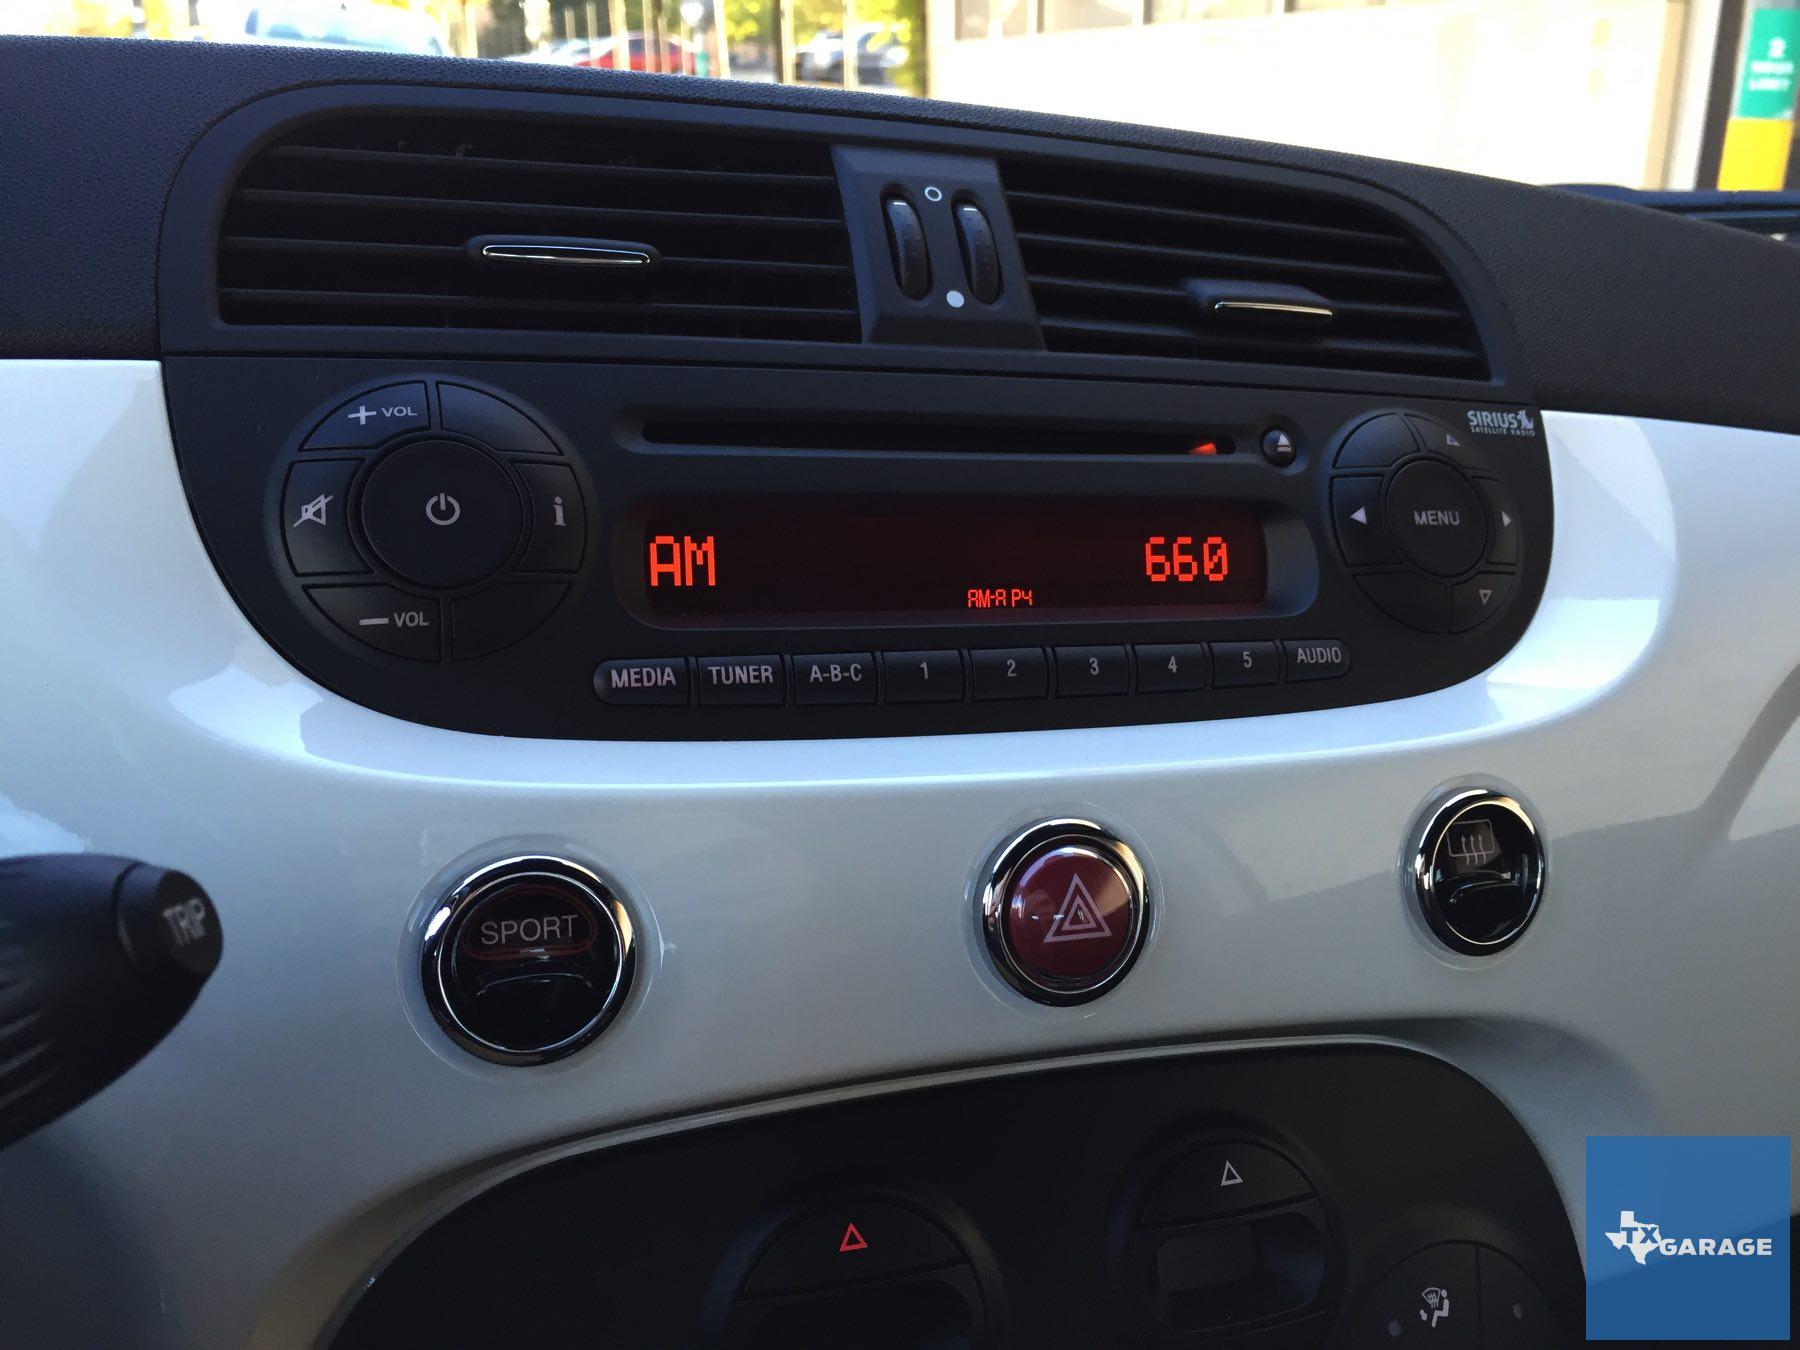 2015-Fiat-500-Abarth-txGarage-006